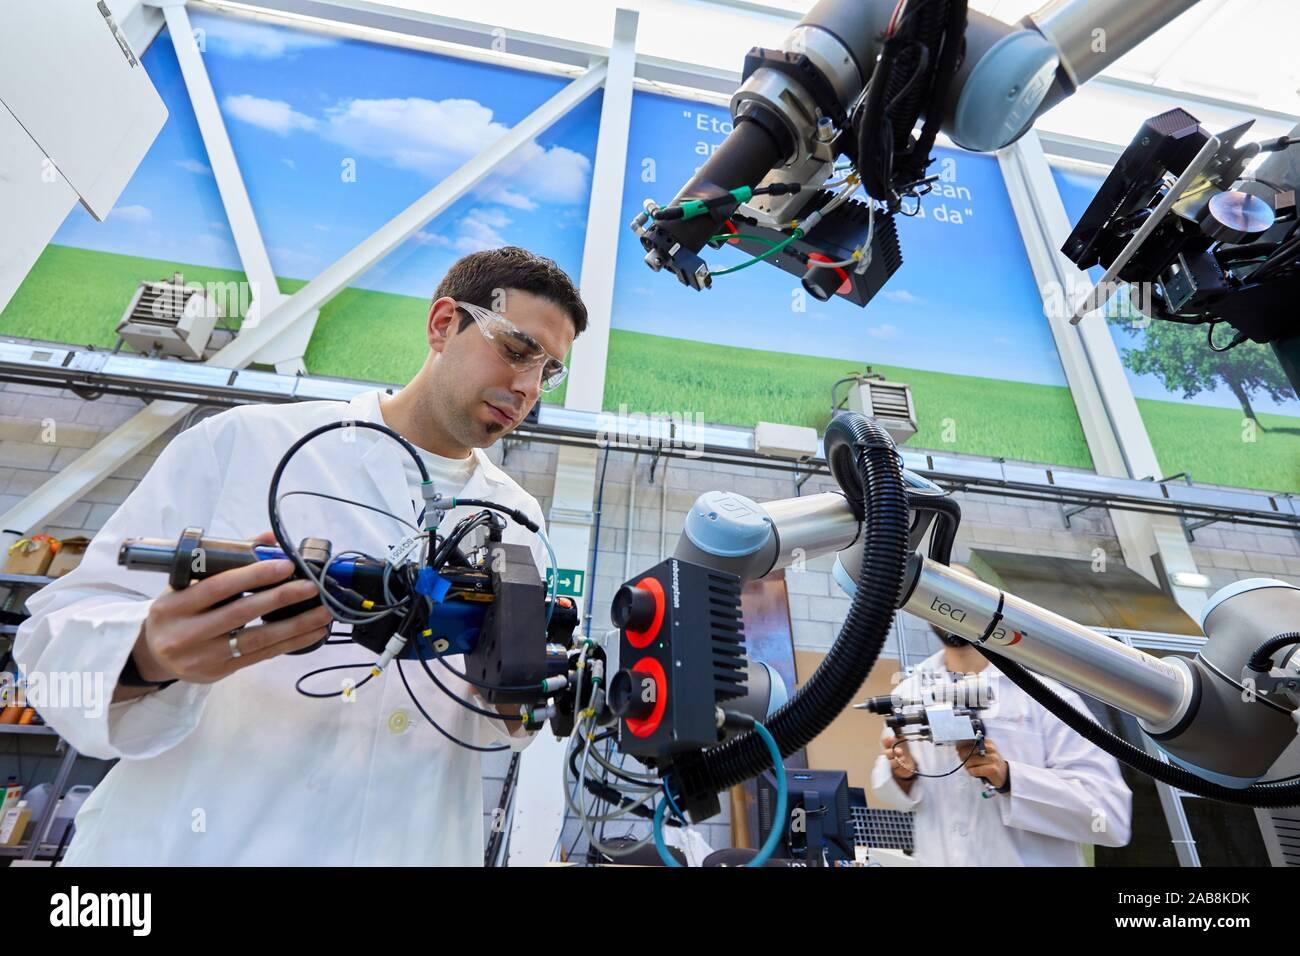 Nutzung von flexiblen Robotik in industriellen Fertigungsprozessen, Mobile Roboter, Advanced Manufacturing Unit, Technology Center, Tecnalia Forschung & Stockfoto